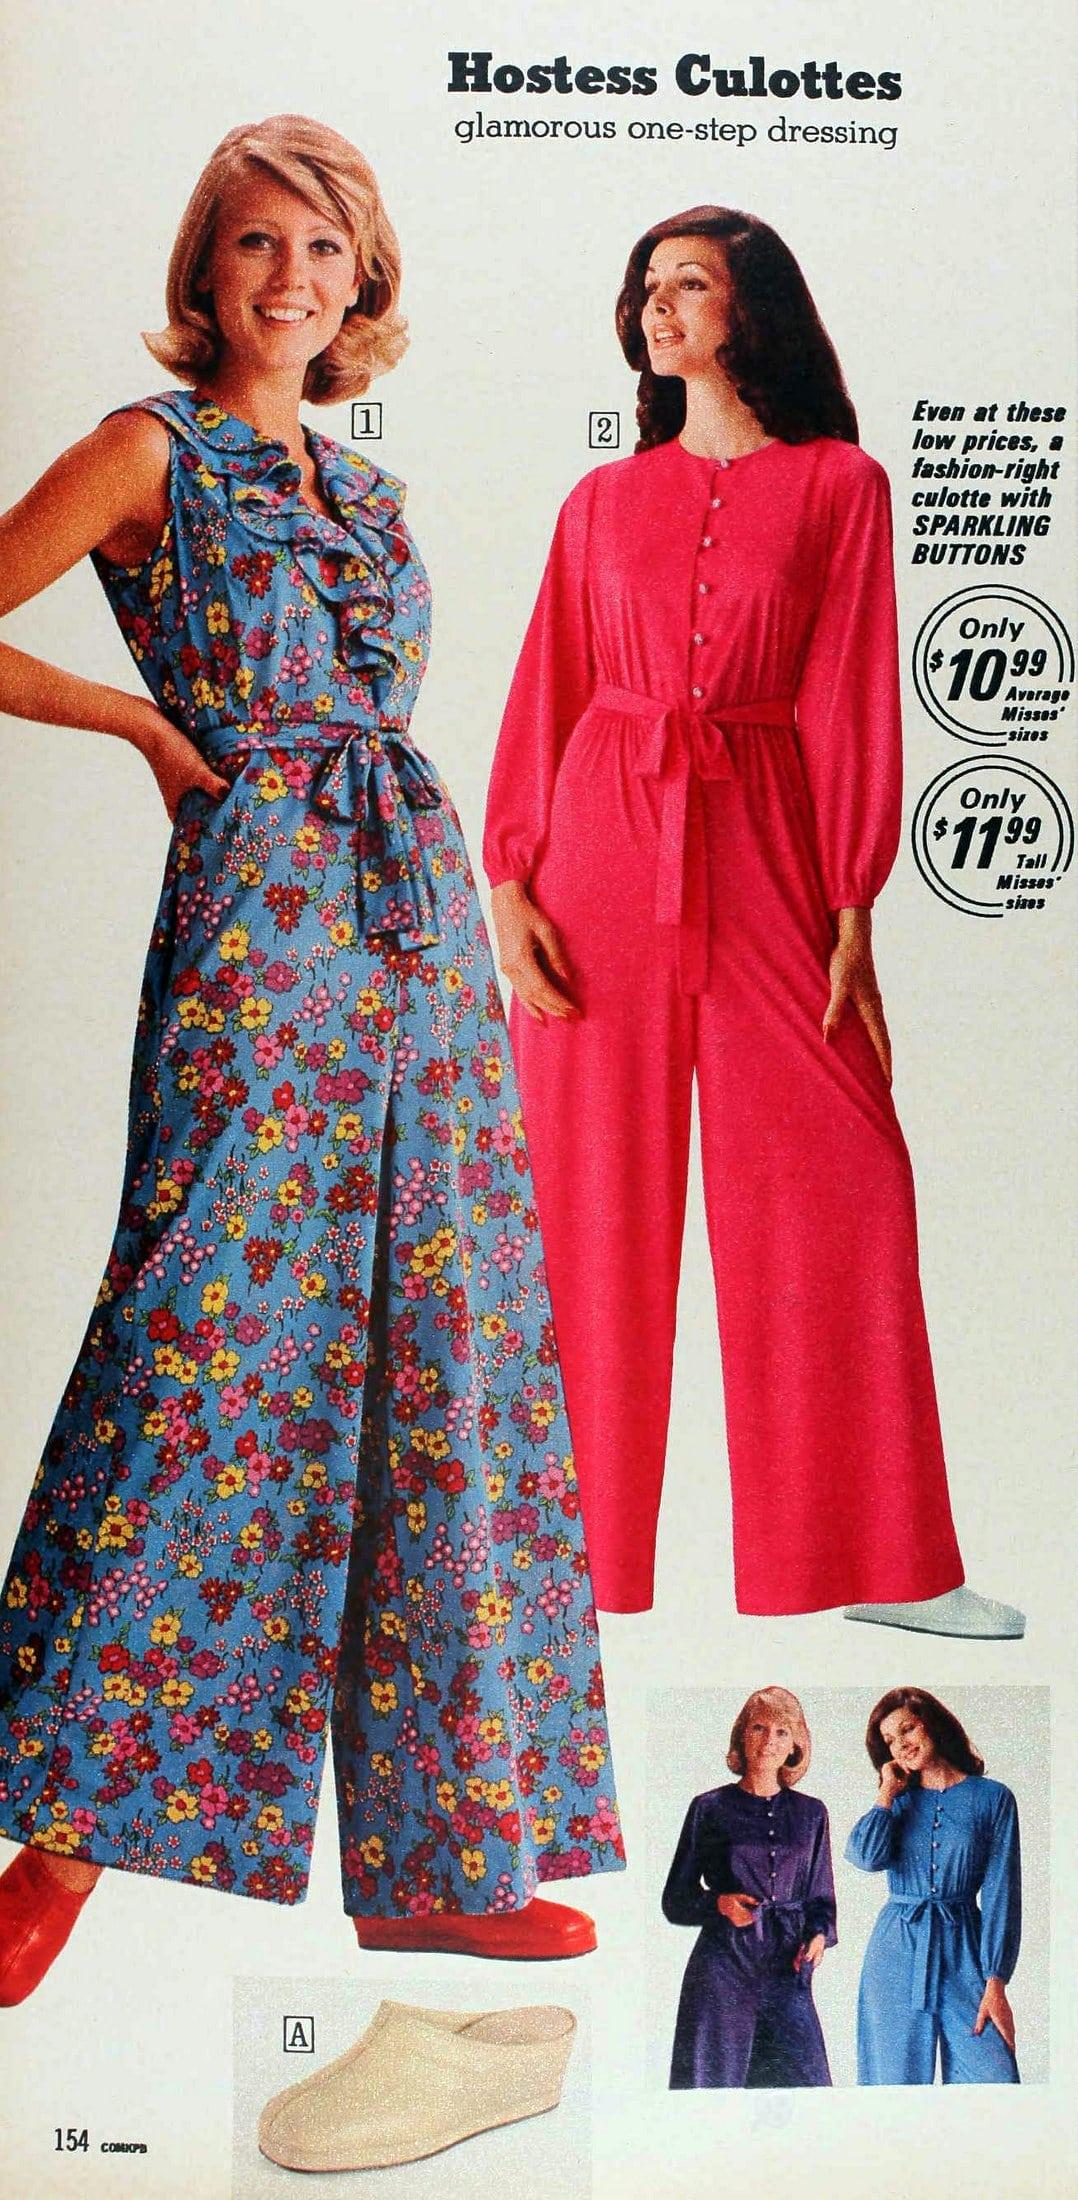 Retro fashion - Hostess culottes (1974)